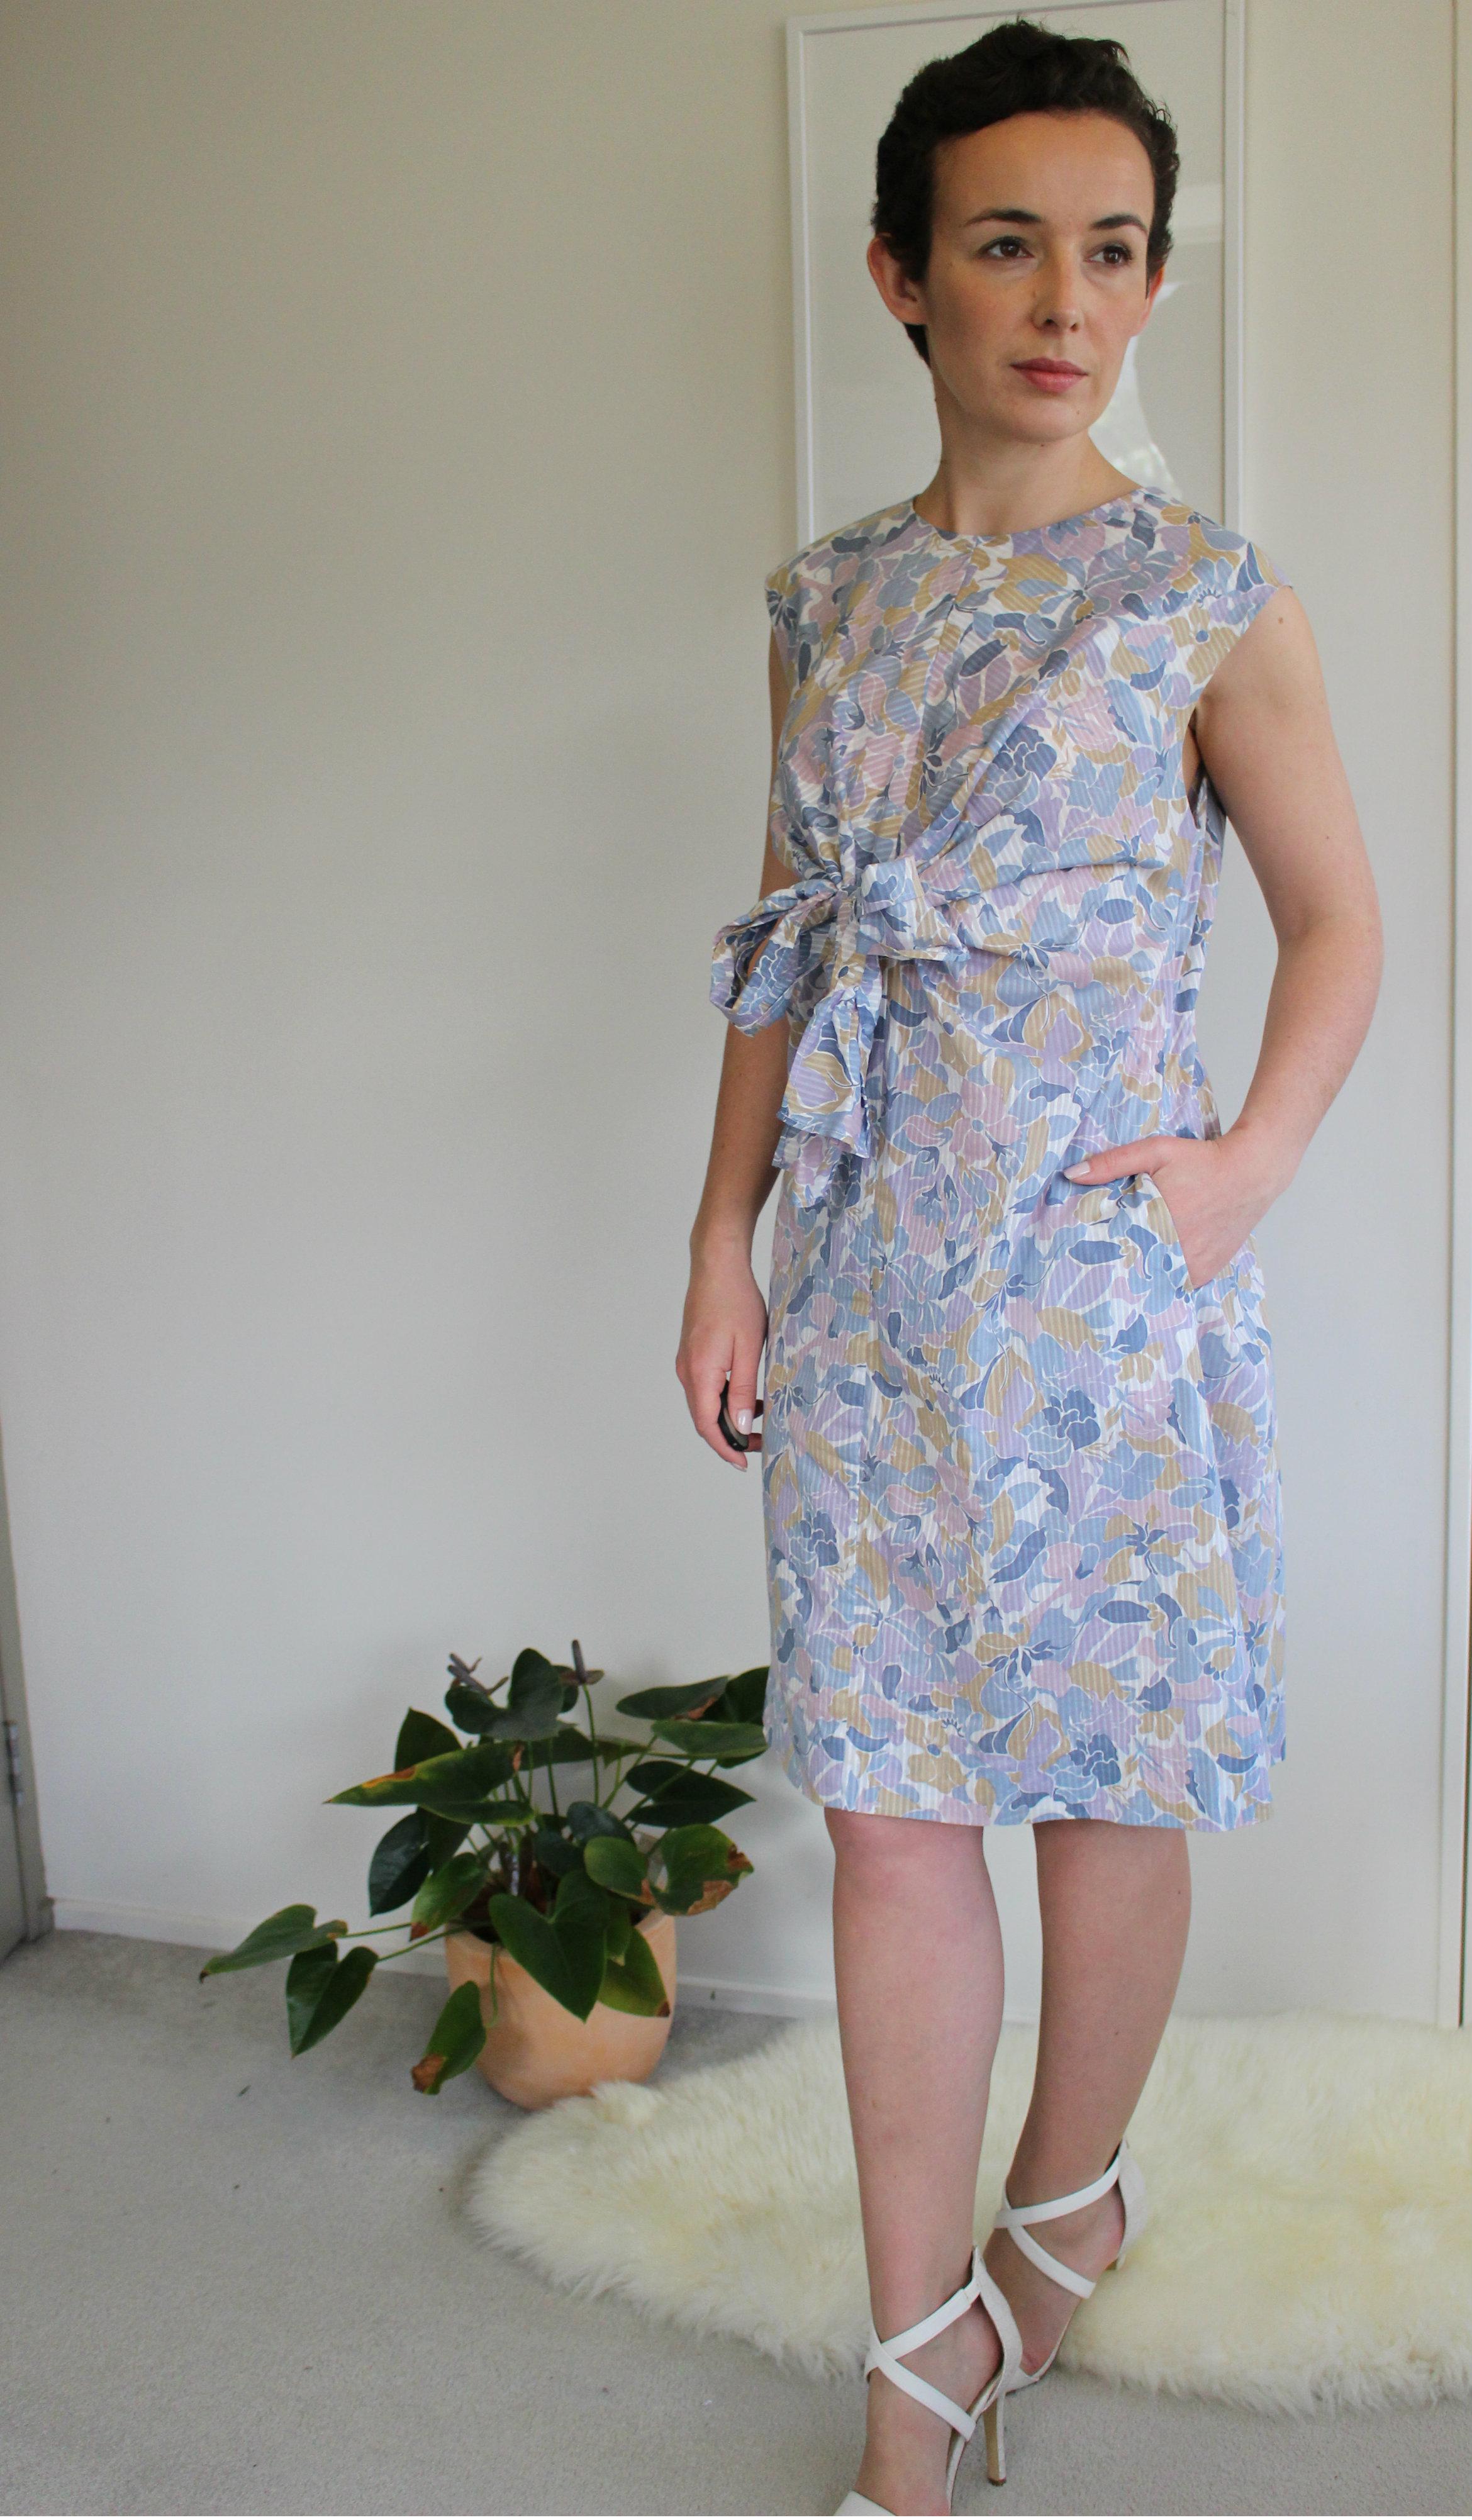 Dress: World, via Salvation Army